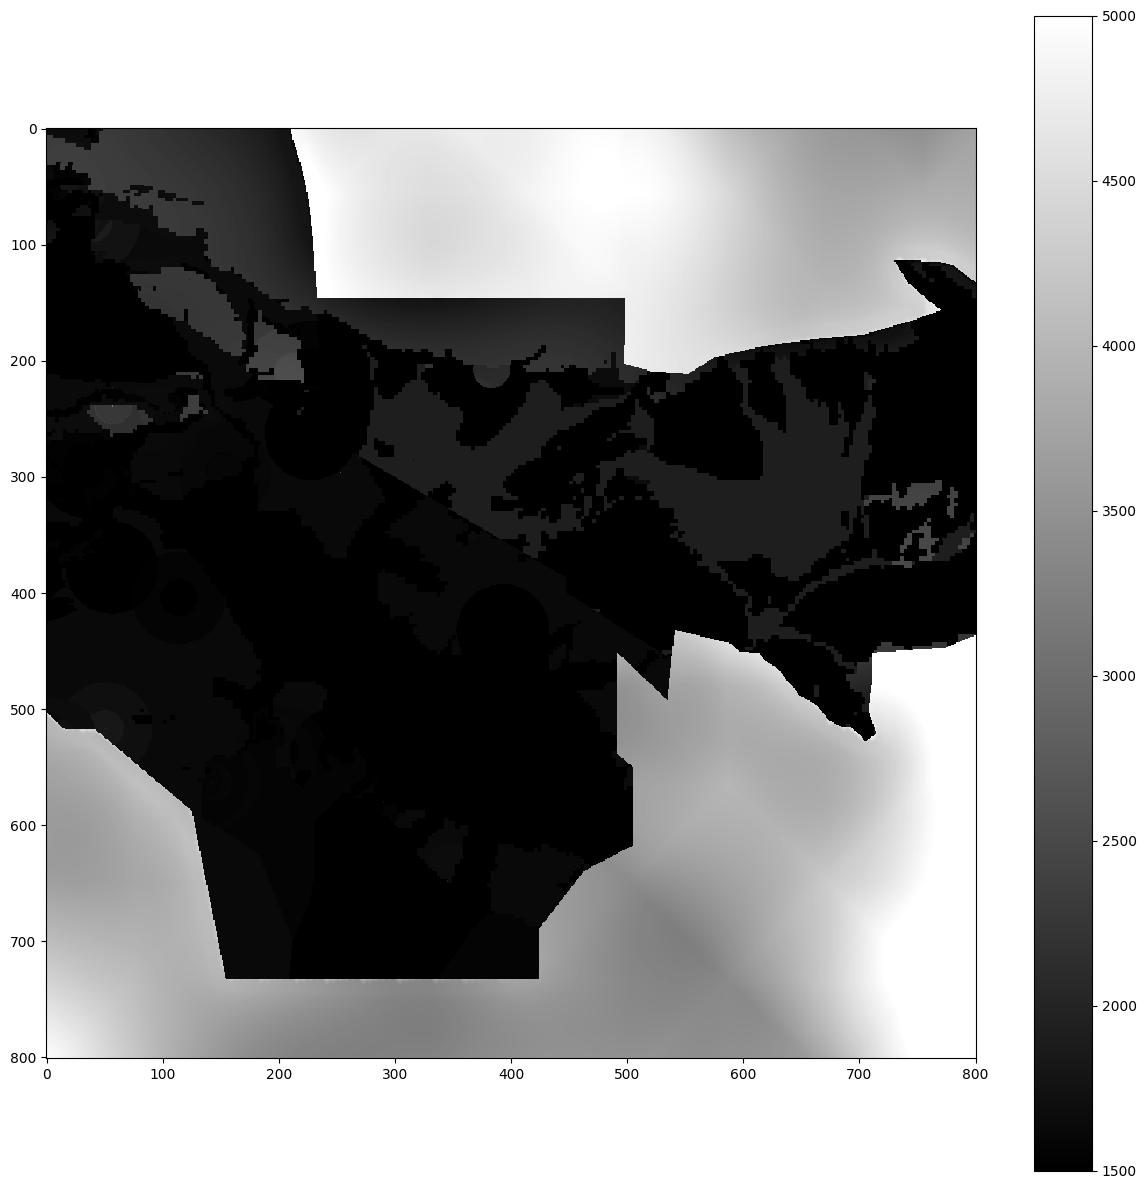 bench/seismic/wp/la_habra/meshes/velocity_model/plots/vp_25.png